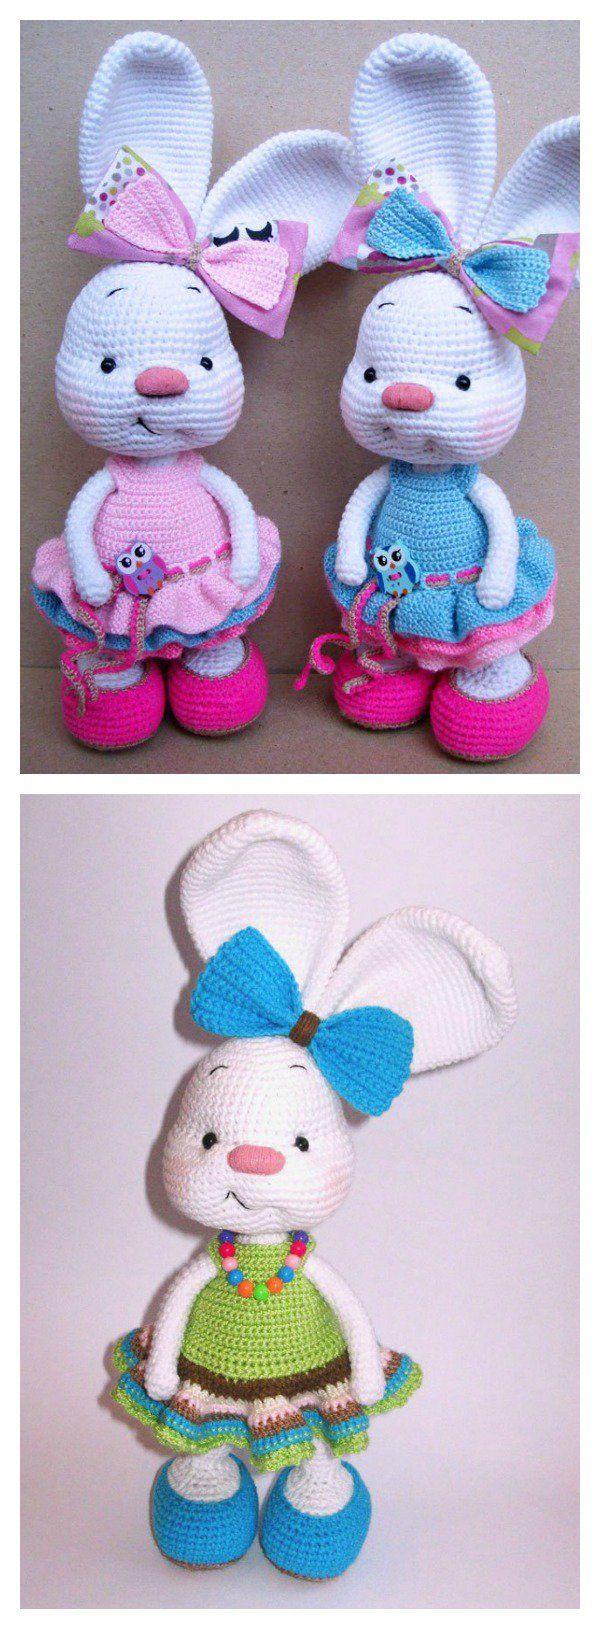 1000 images about crochet thread mini amp micro on pinterest - Crochet Pretty Bunny Amigurumi In Dress Free Pattern